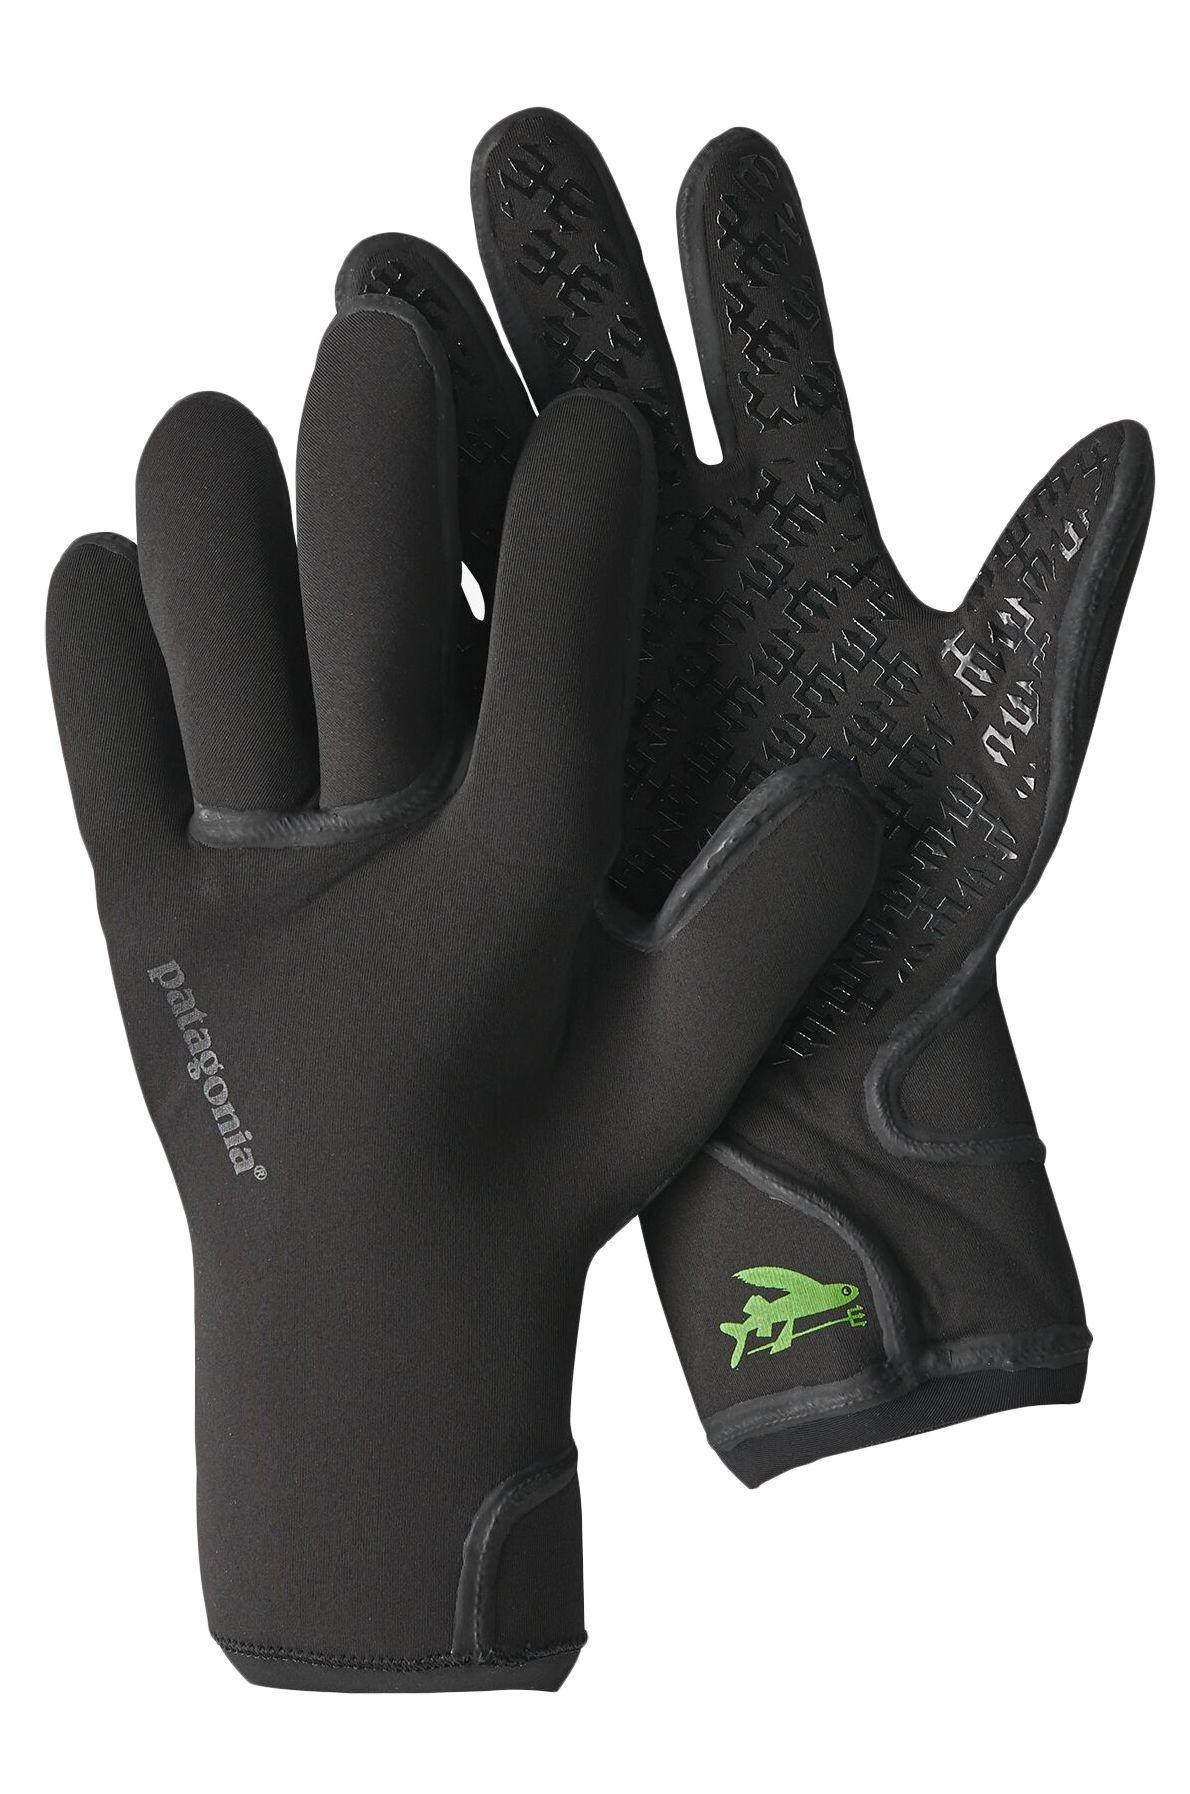 Patagonia Neoprene Gloves R2 YULEX GLOVES Black